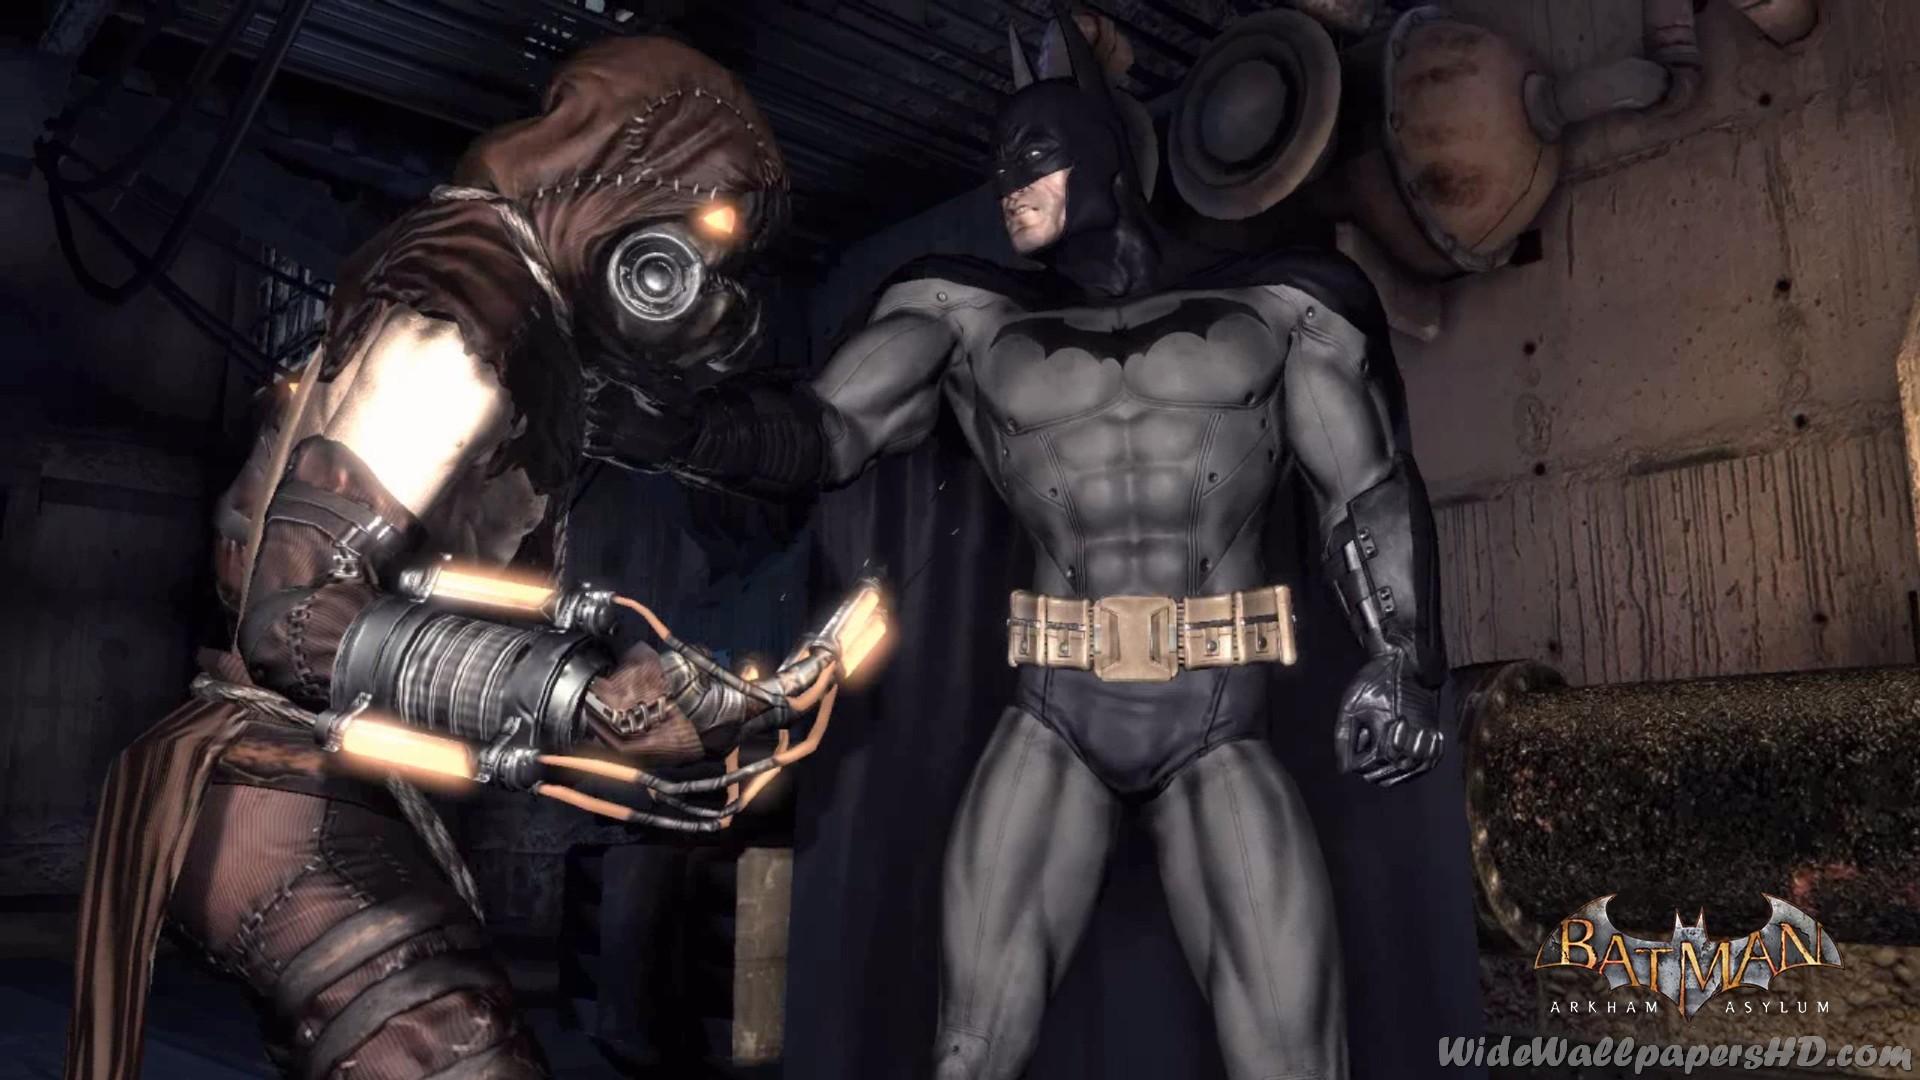 Res: 1920x1080, Batman-and-Scarecrow-Batman-Arkham-Asylum-Wallpapers-HD.jpg